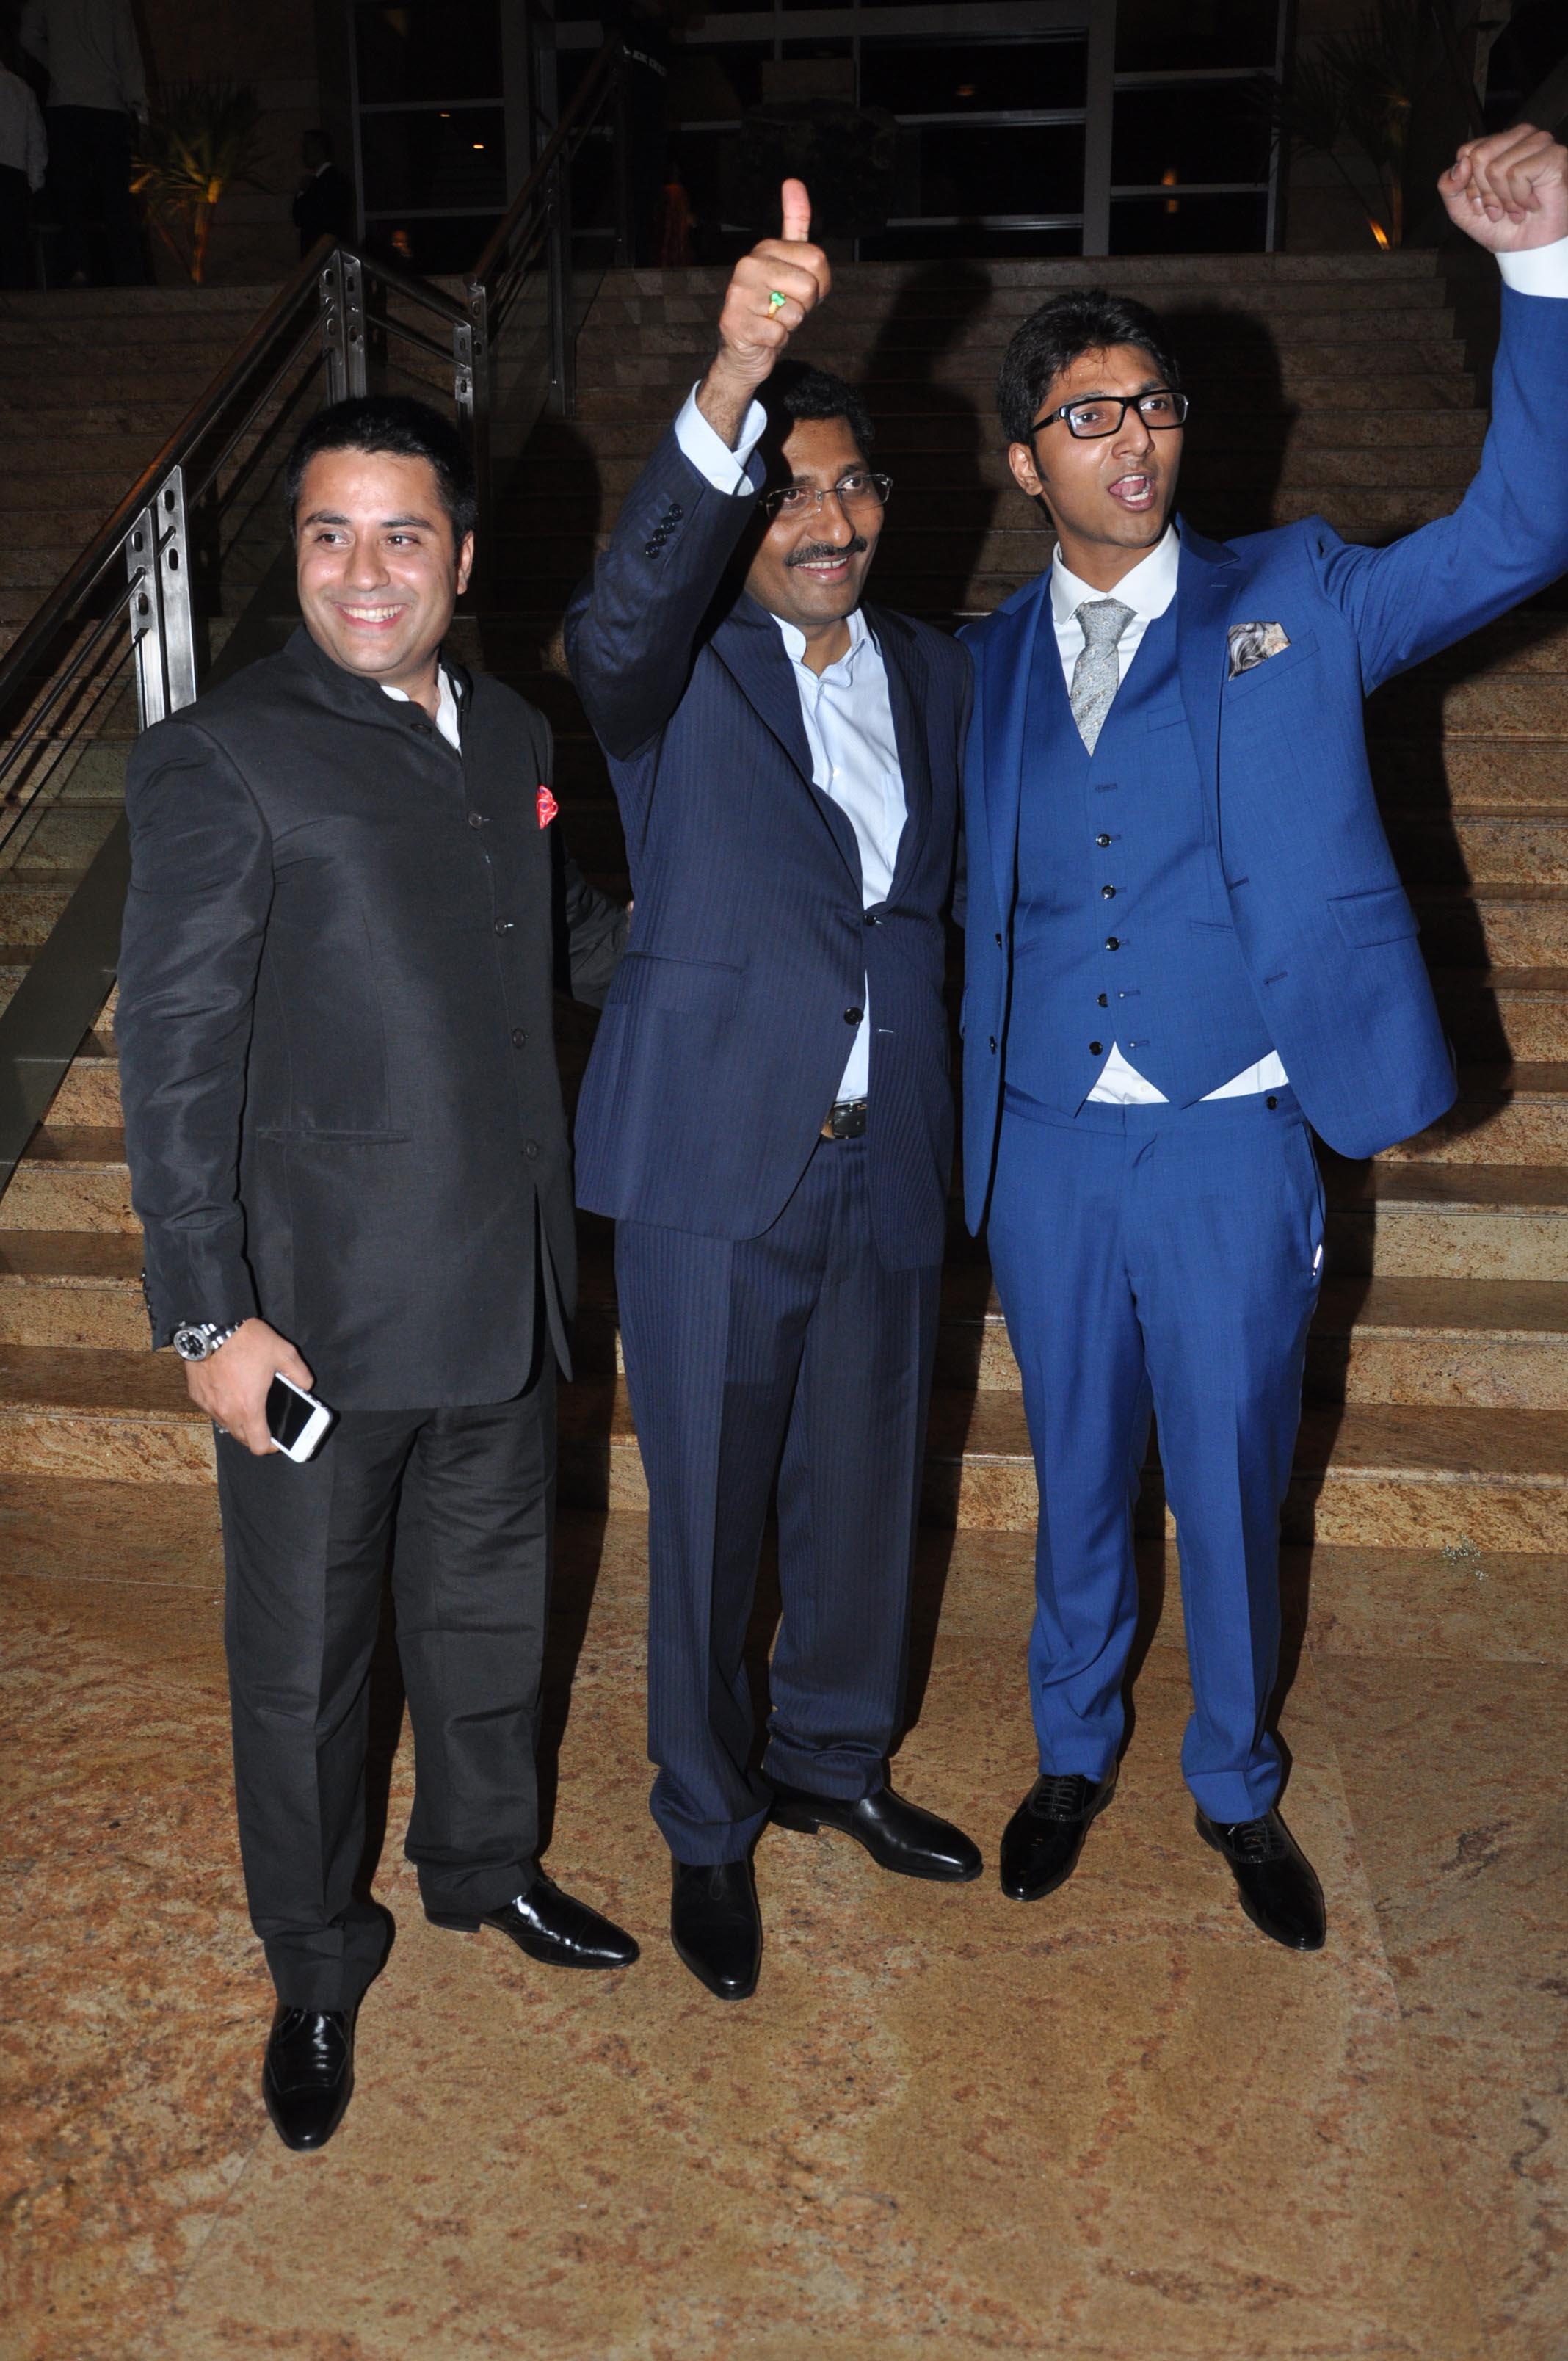 Directors of Jai Maharashtra Channel Waahiid Ali Khan, Sudhakar Shetty & Sohan Shetty